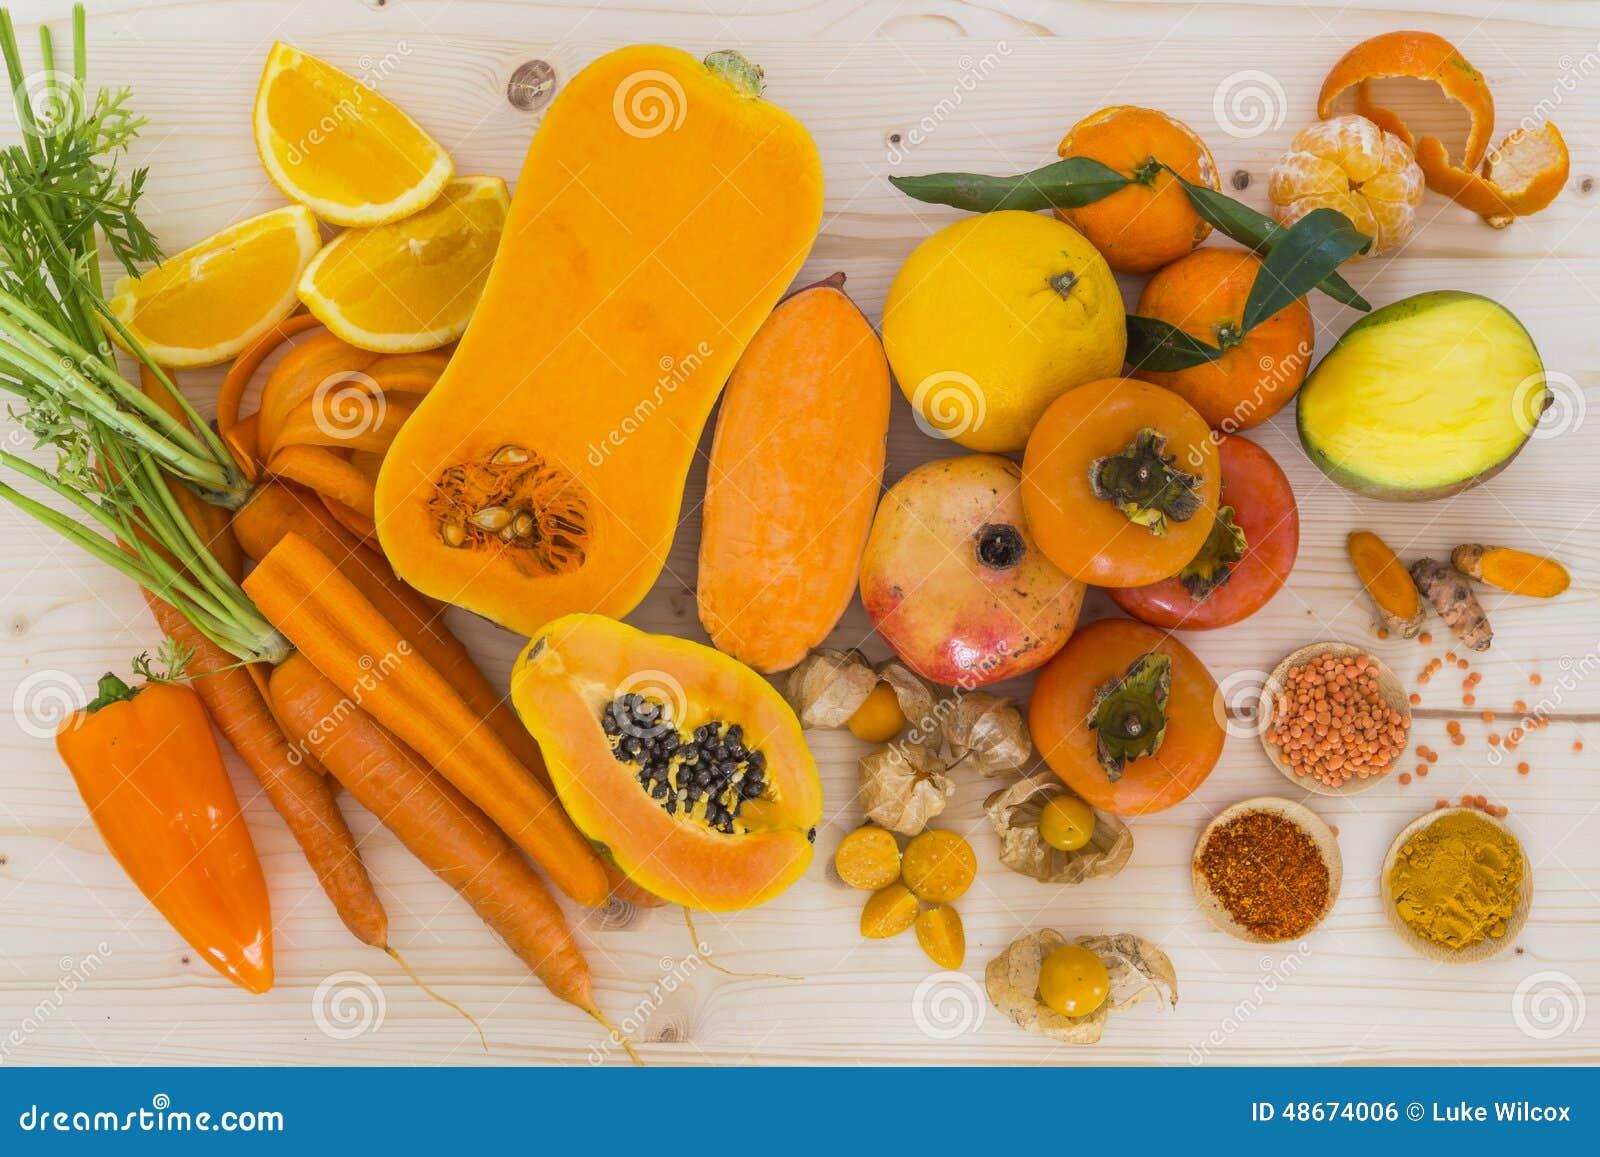 Oranje groenten en fruit